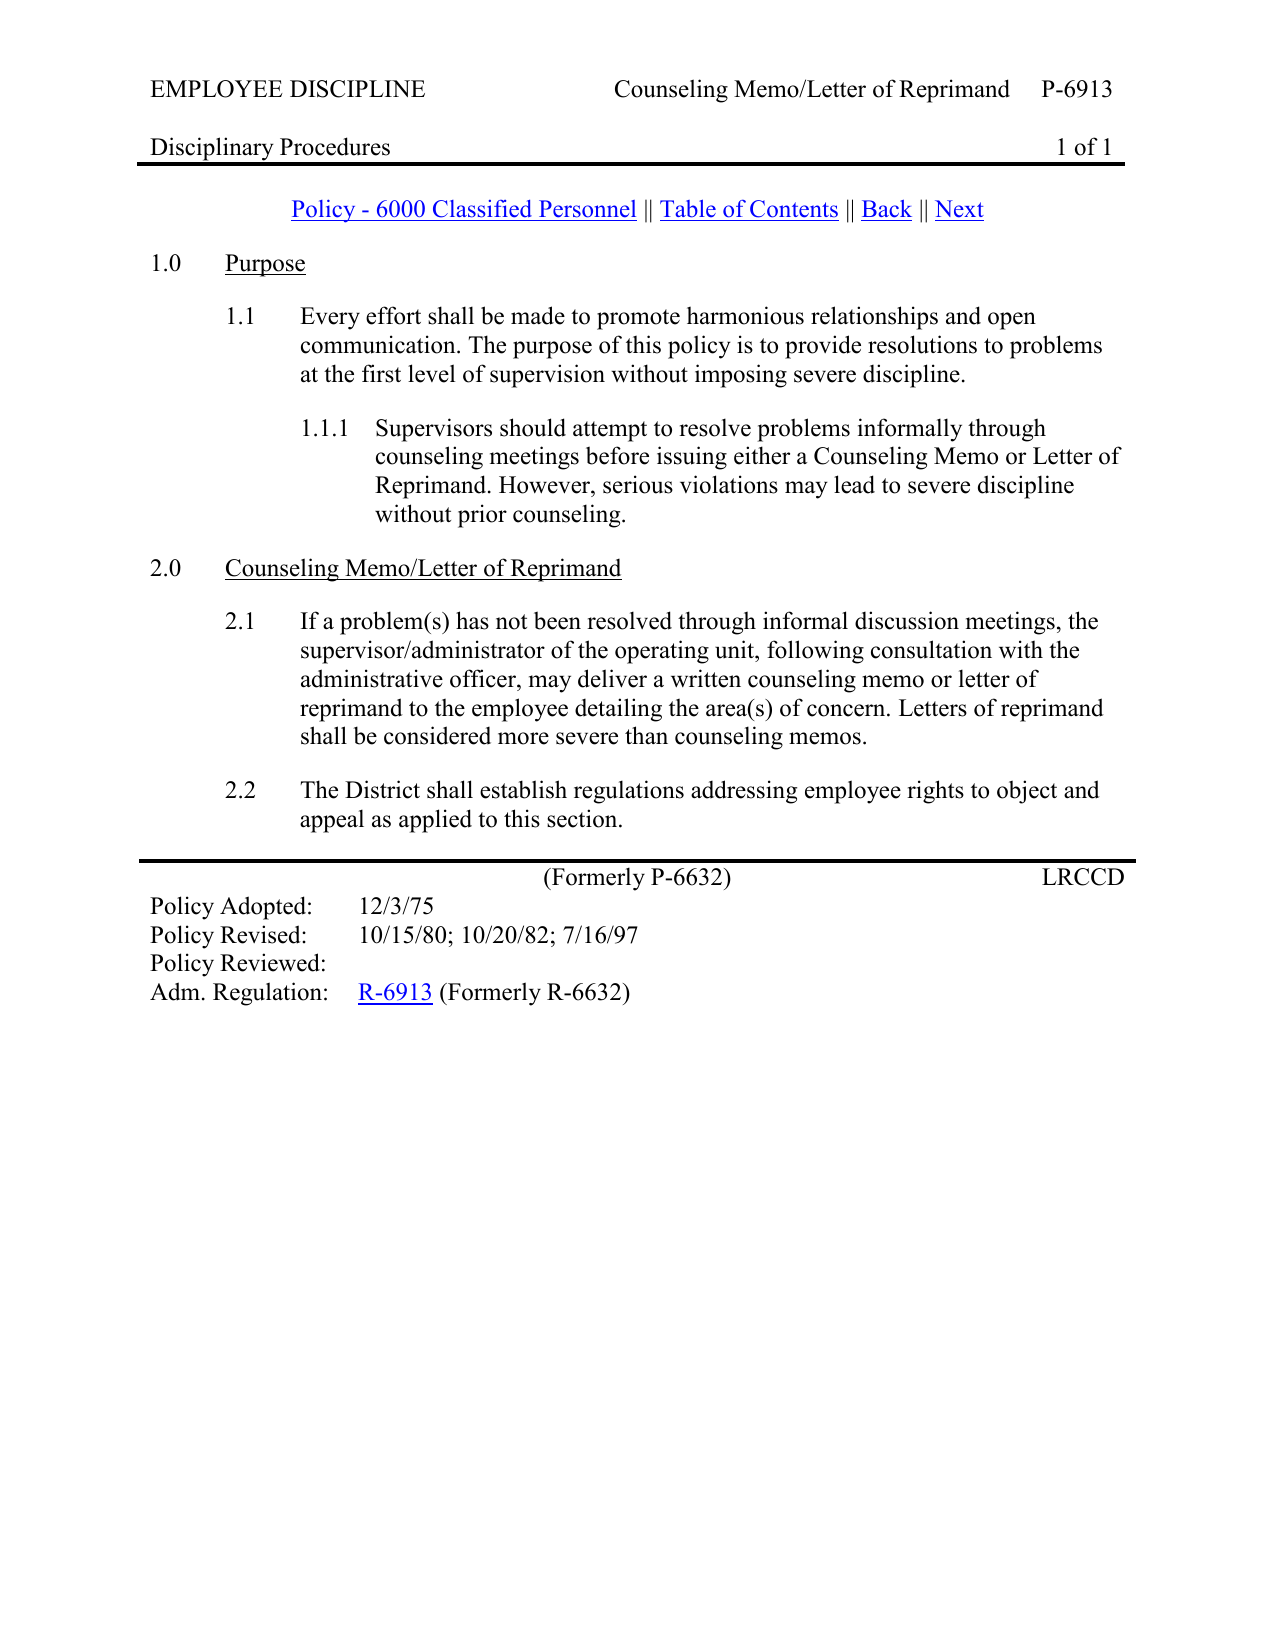 EMPLOYEE DISCIPLINE Counseling MemoLetter of Reprimand P